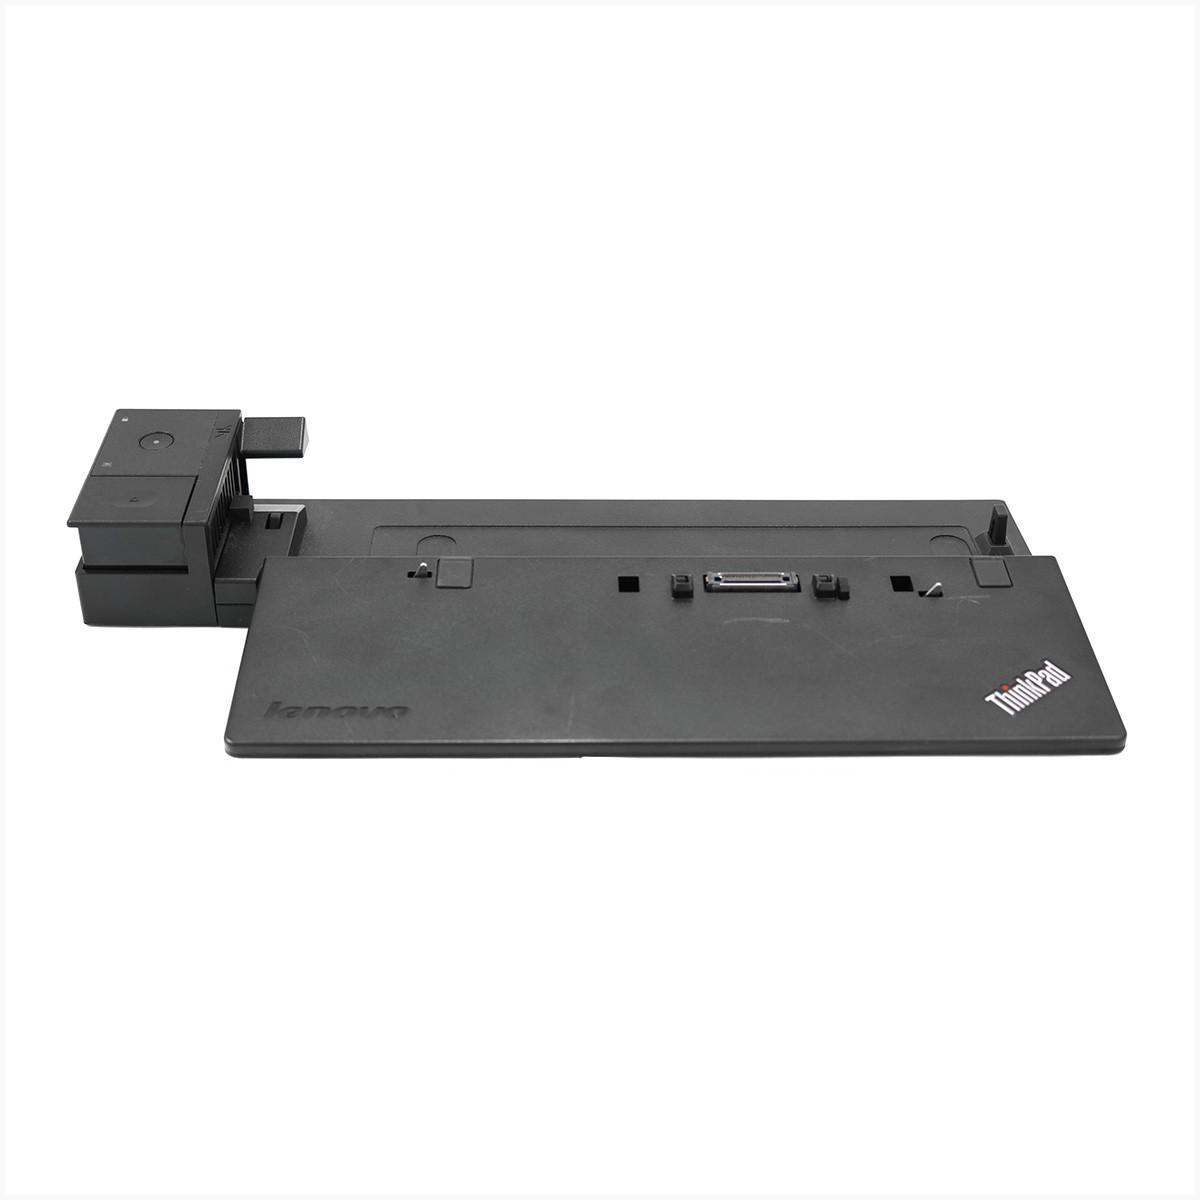 Dockstation Lenovo ThinkPad Pro Dock 40A1 - Usado